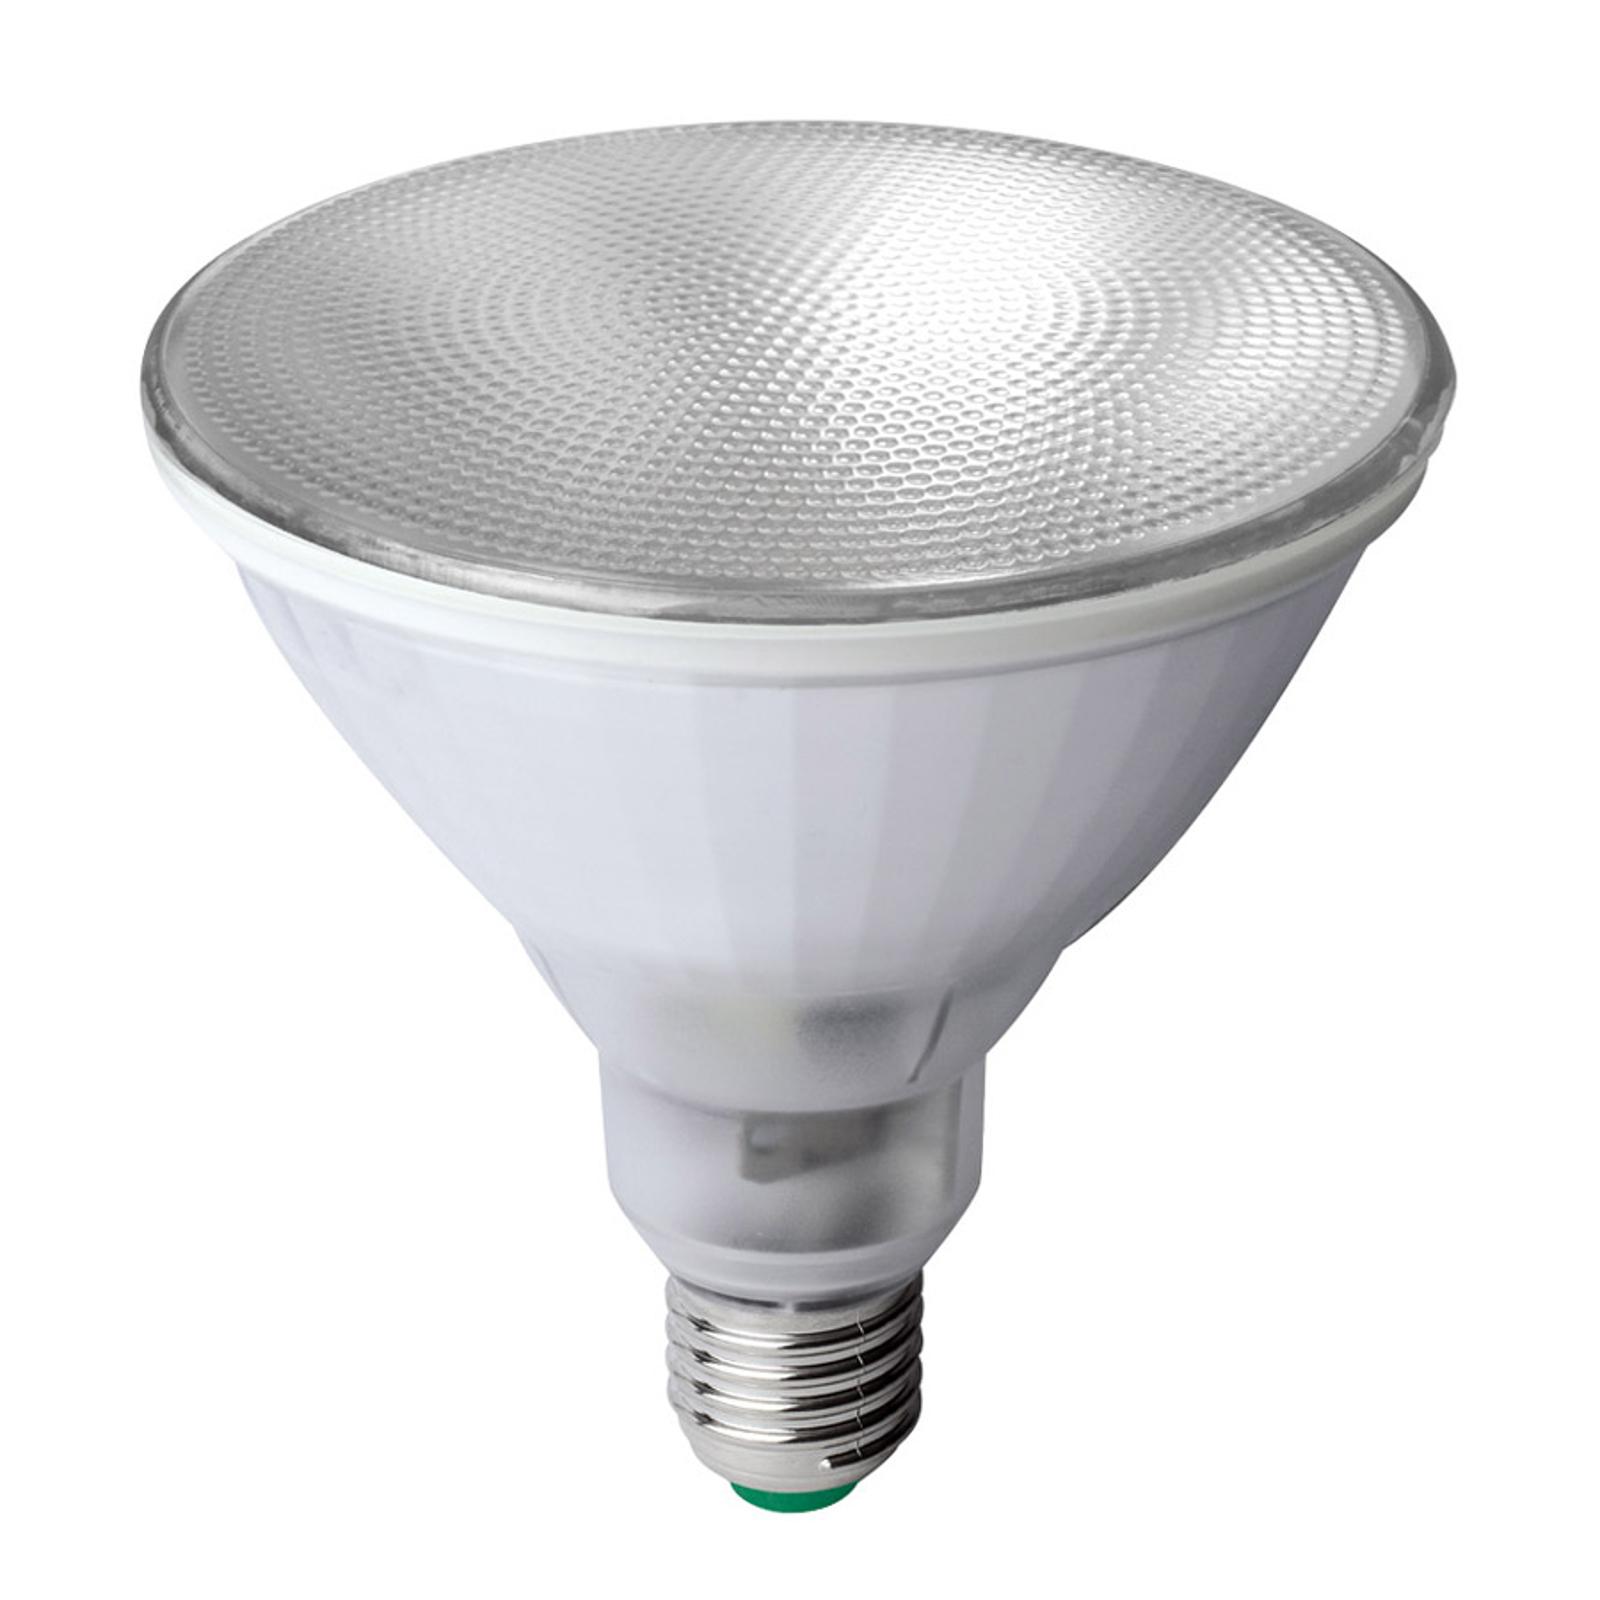 Lampadina per piante LED 8,5W E27 PAR38 35°